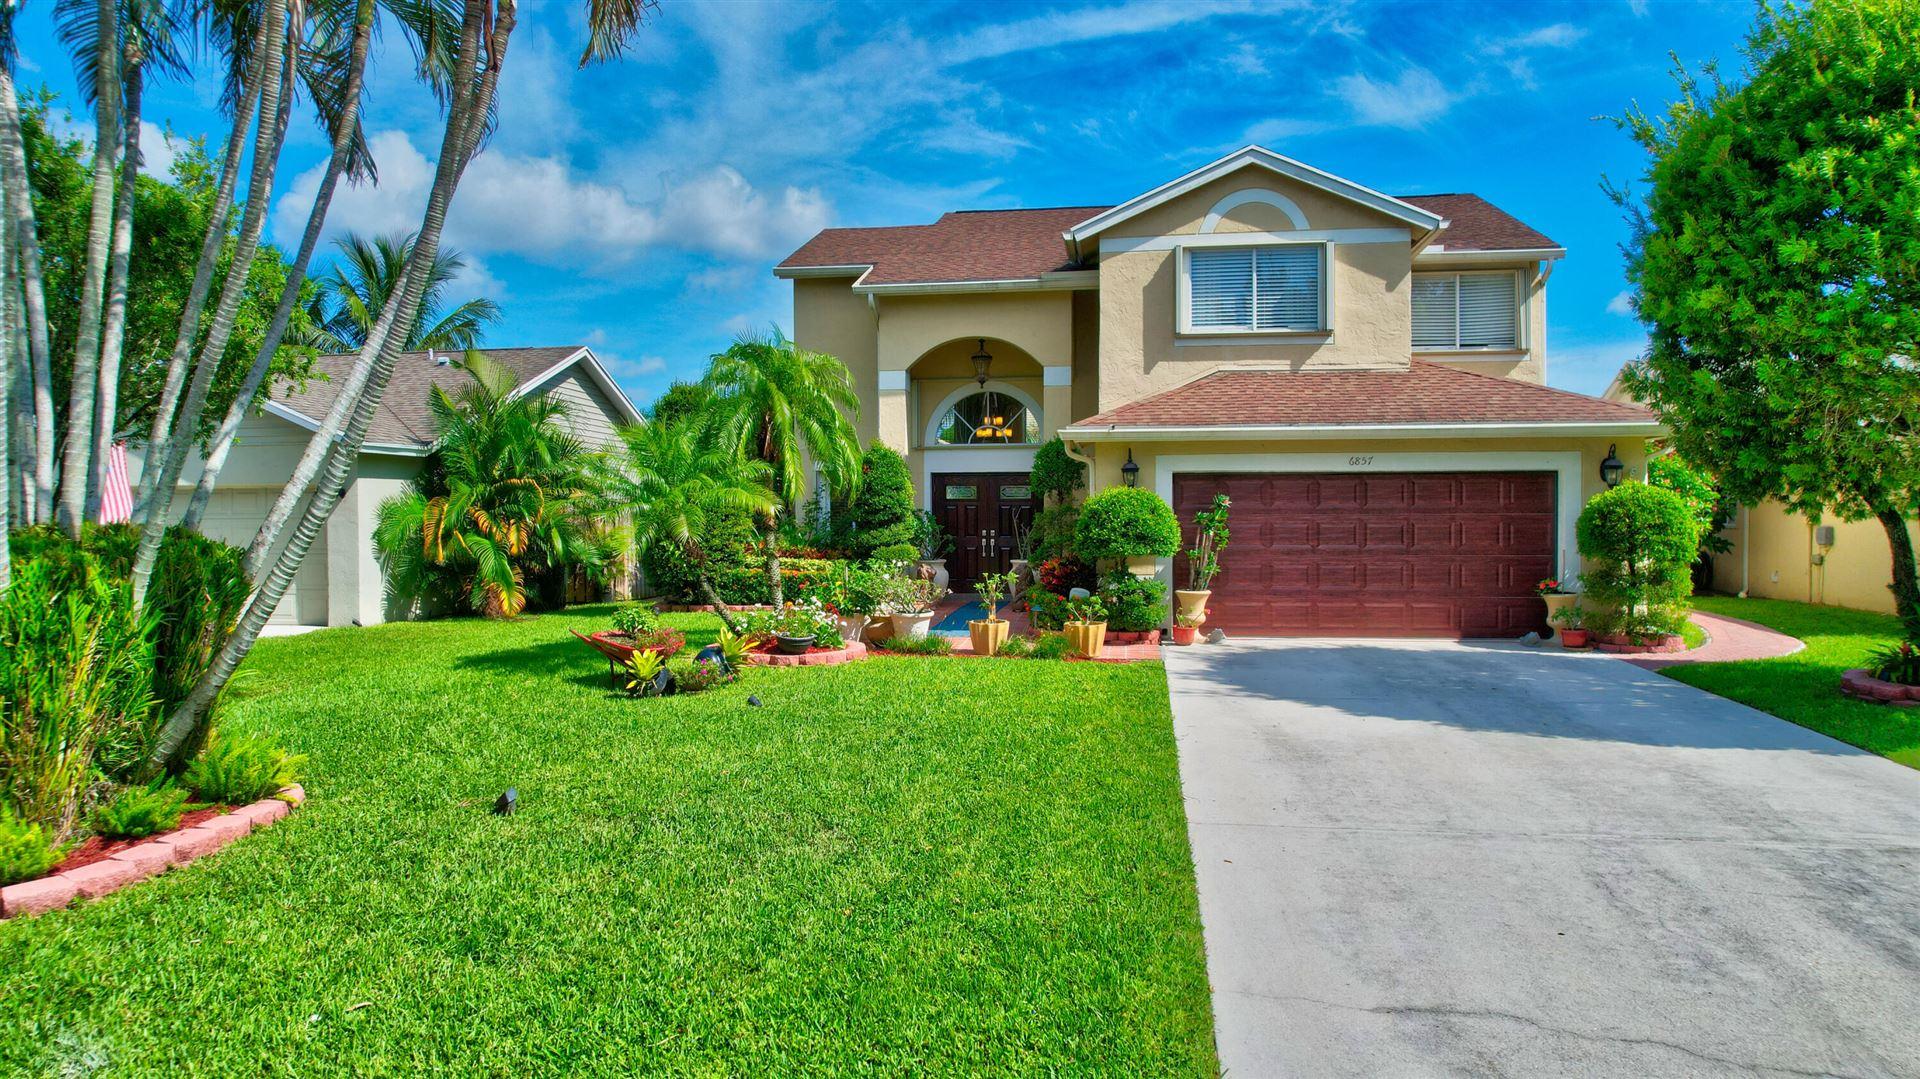 6857 Farragut Lane, Boynton Beach, FL 33437 - MLS#: RX-10742406